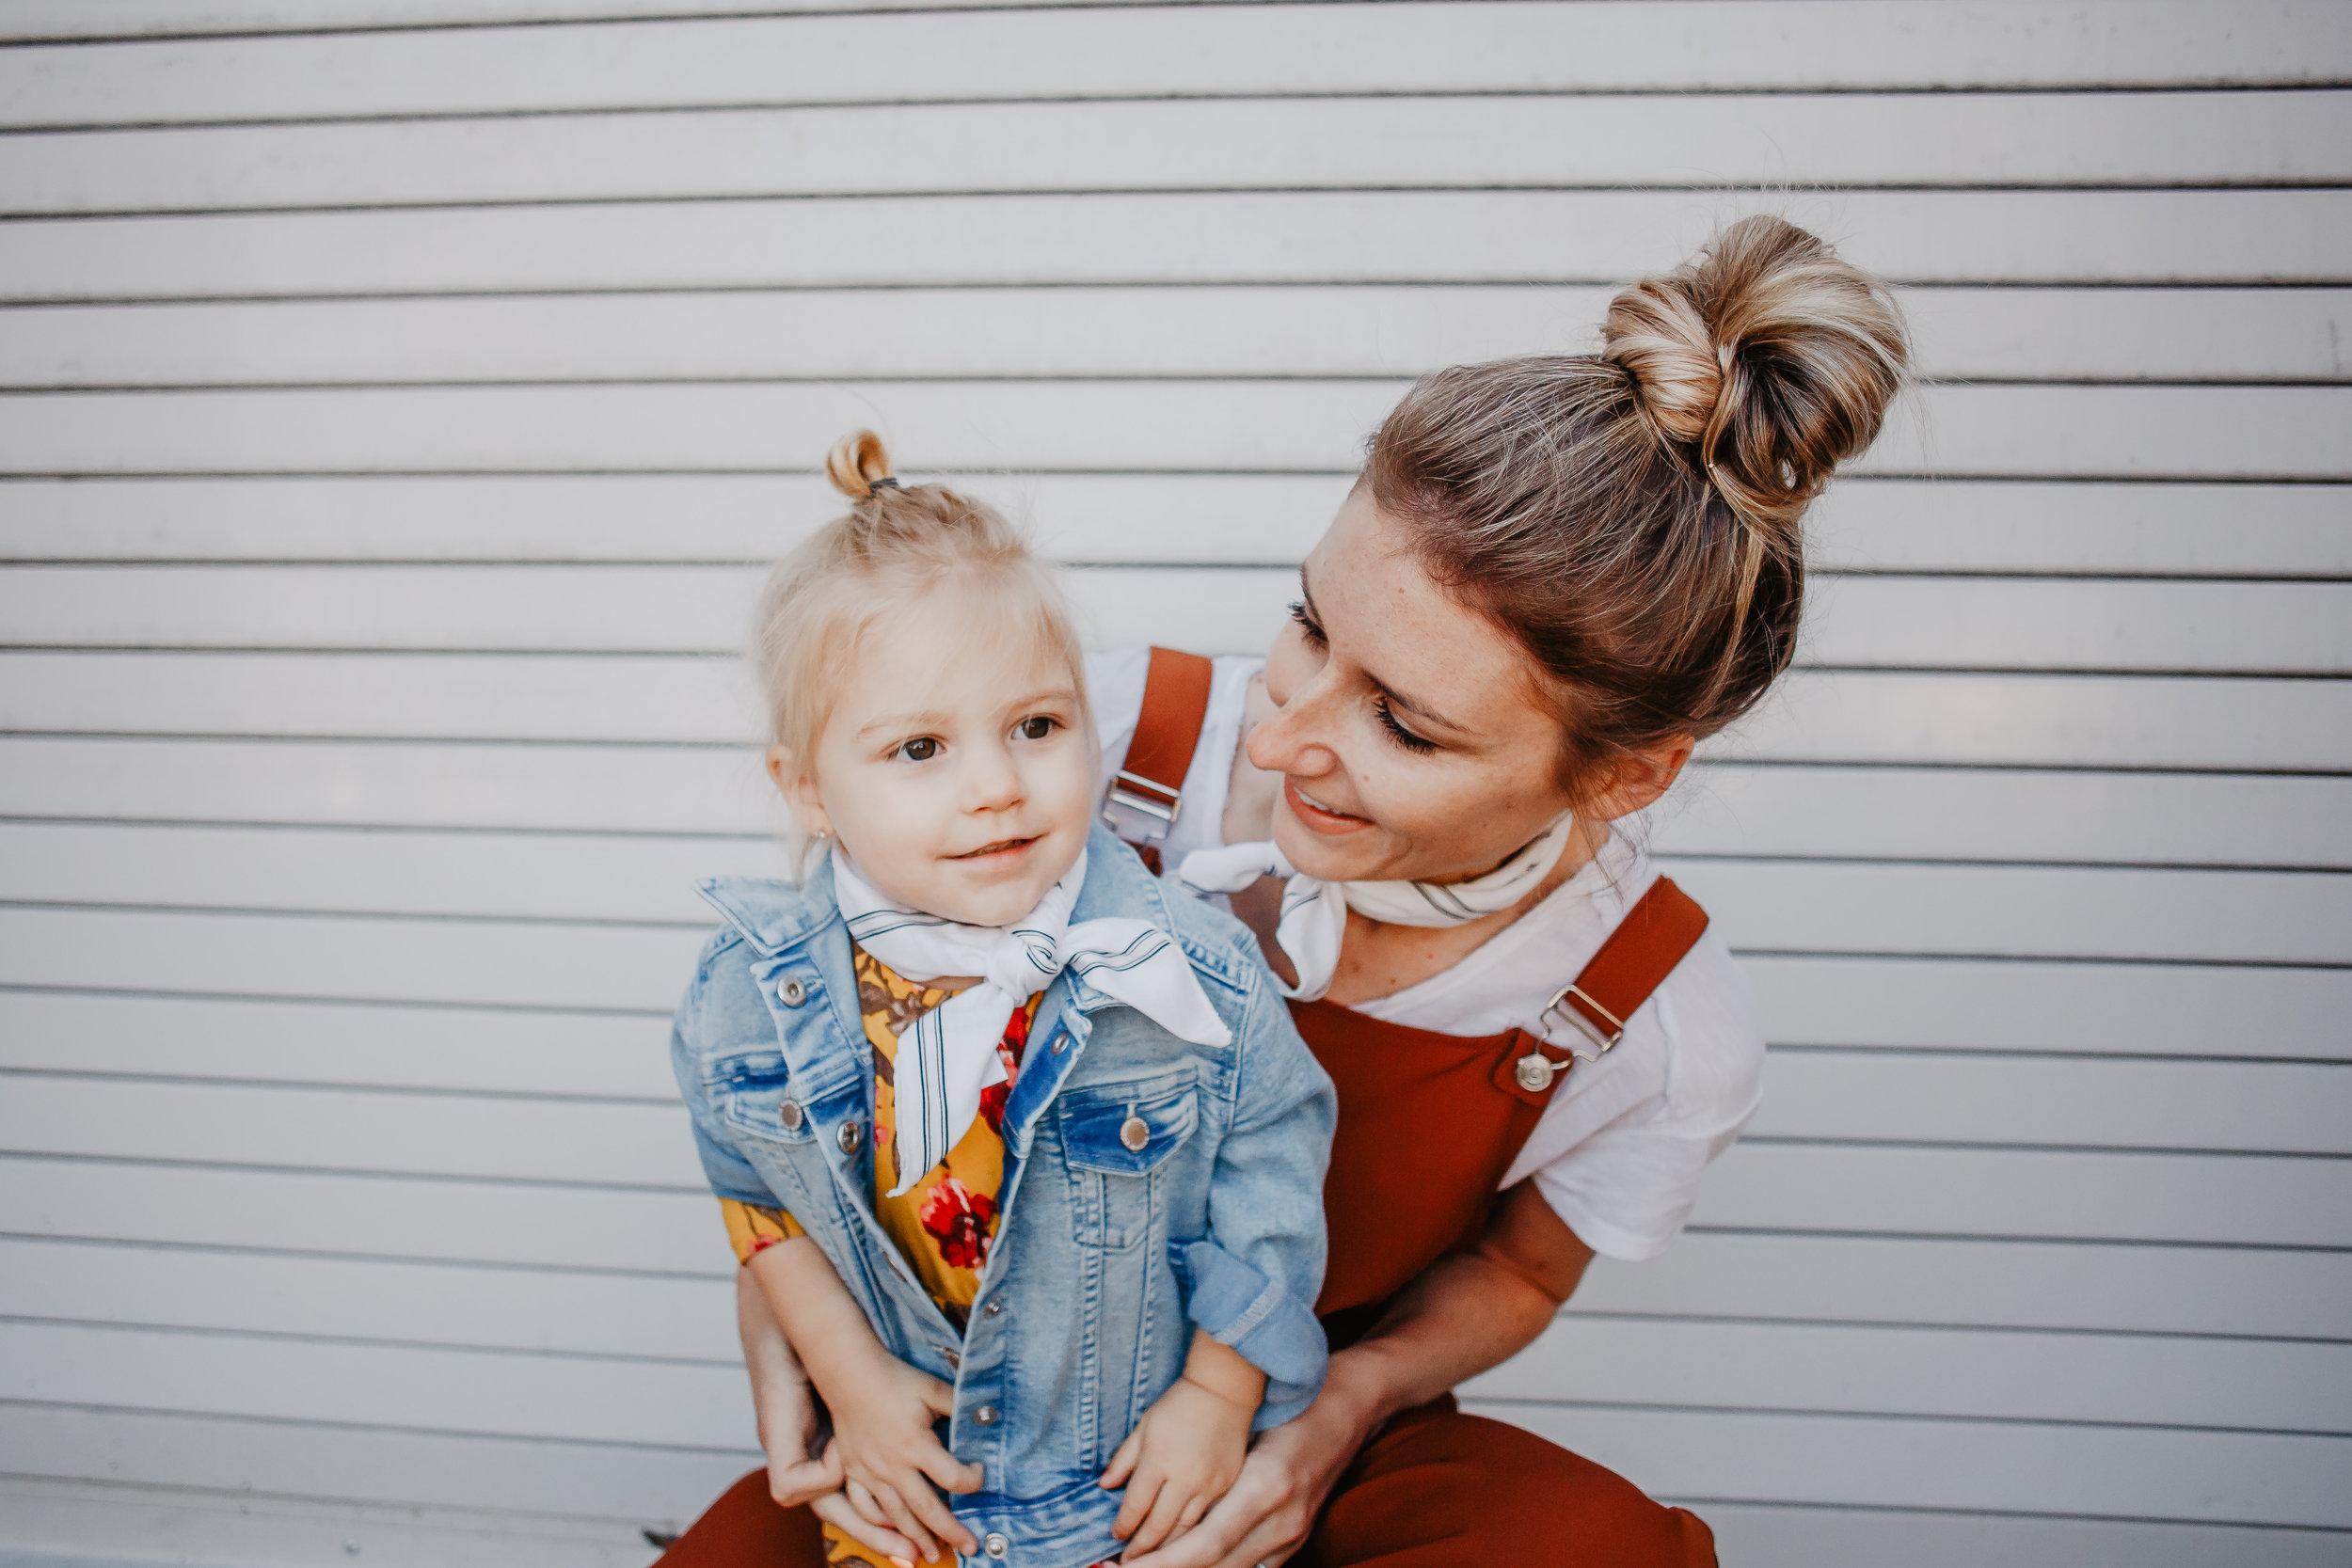 Cute Spring Kids Clothes - Affordable Women's Fashion - Orange Women's Jumpsuit - Yellow Floral Kids Maxi Dress